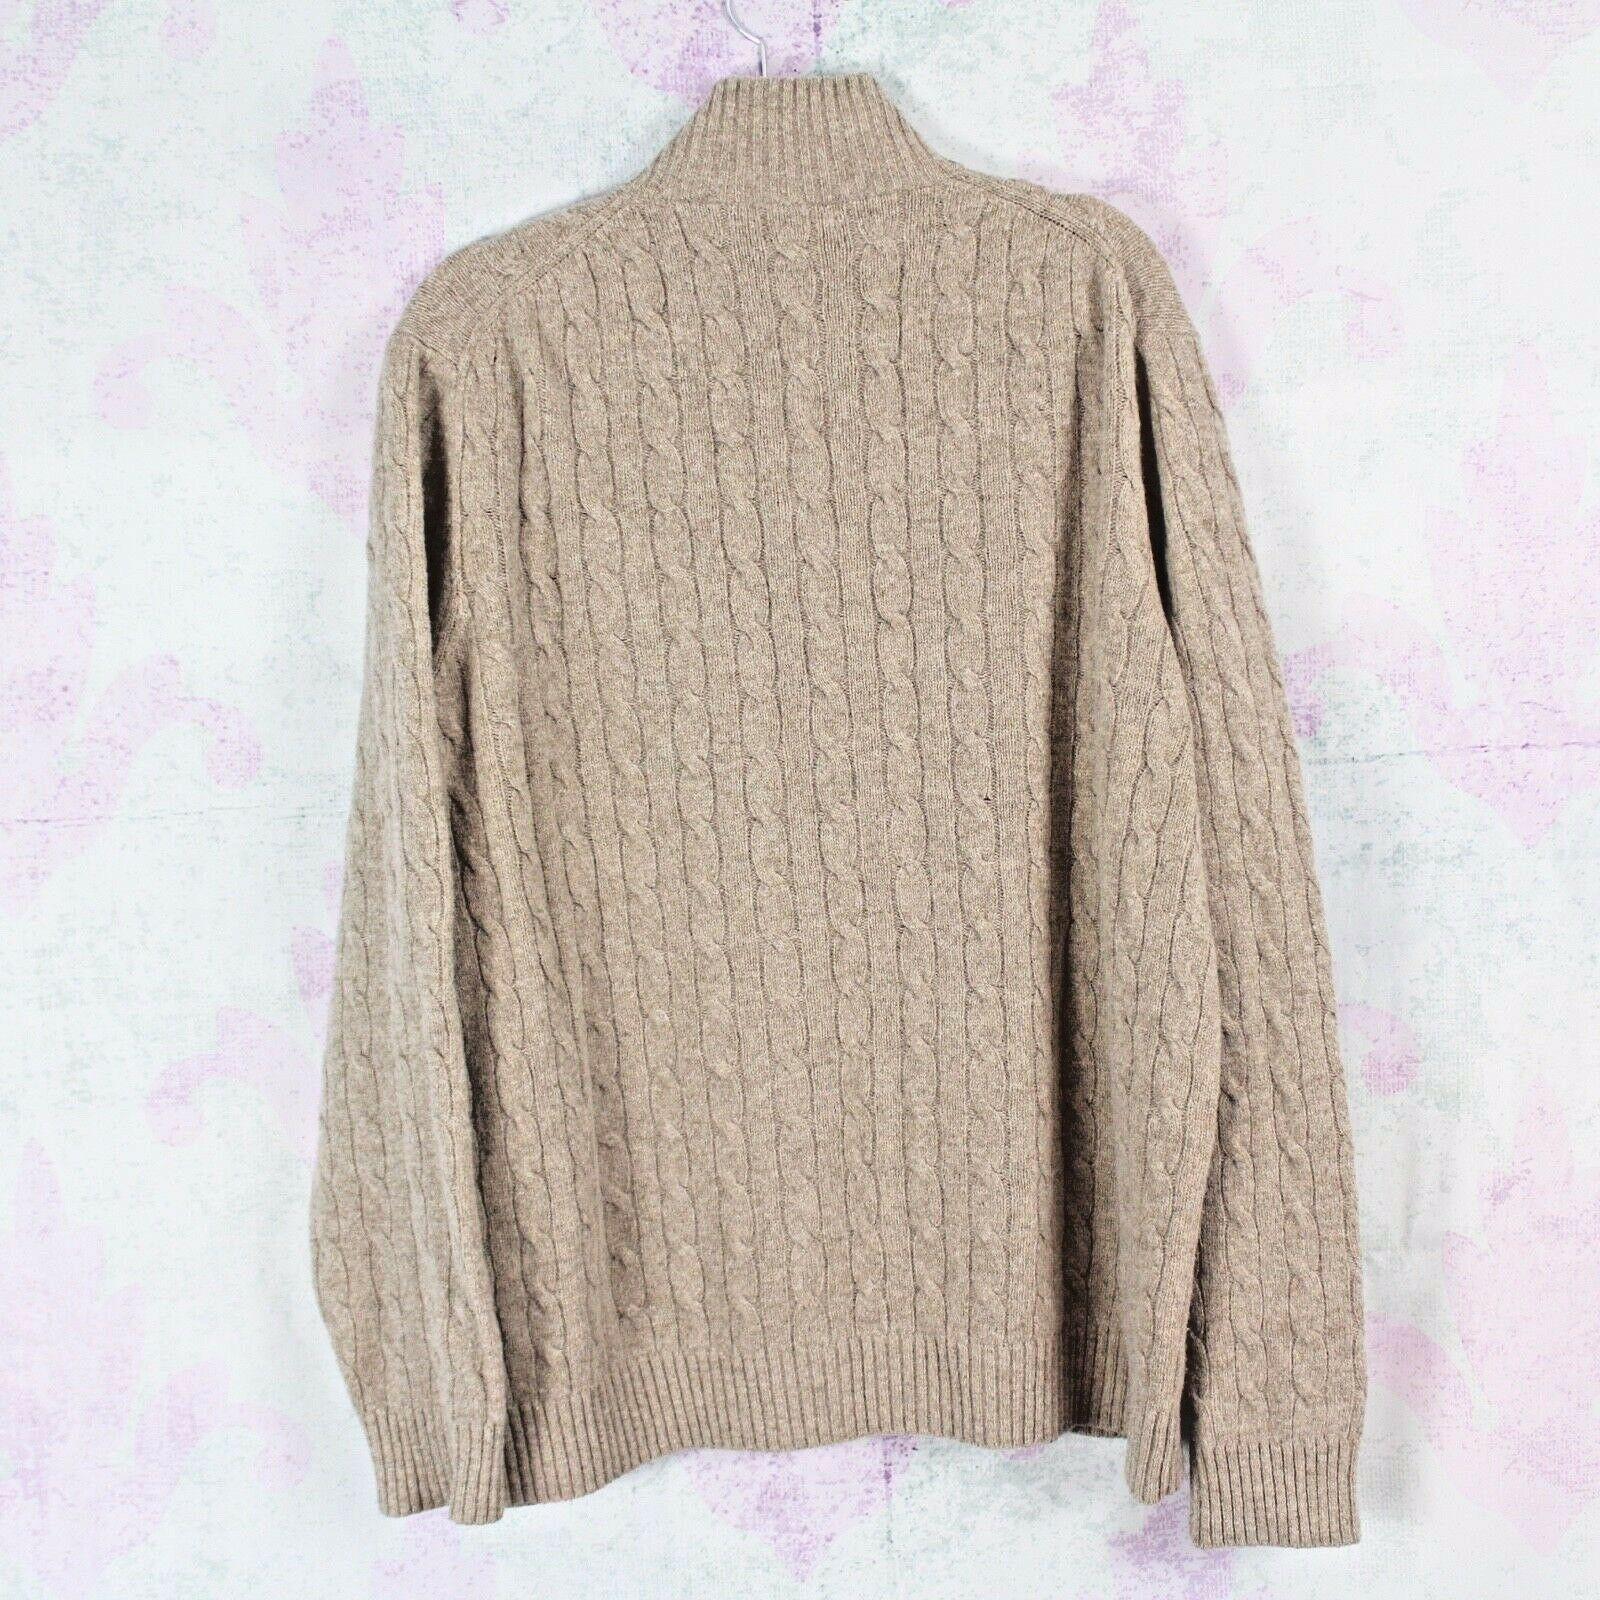 J.Crew Men's XL Beige Tan 100% Lambs Wool 1/2 Zip Cable Knit Pullover Sweater